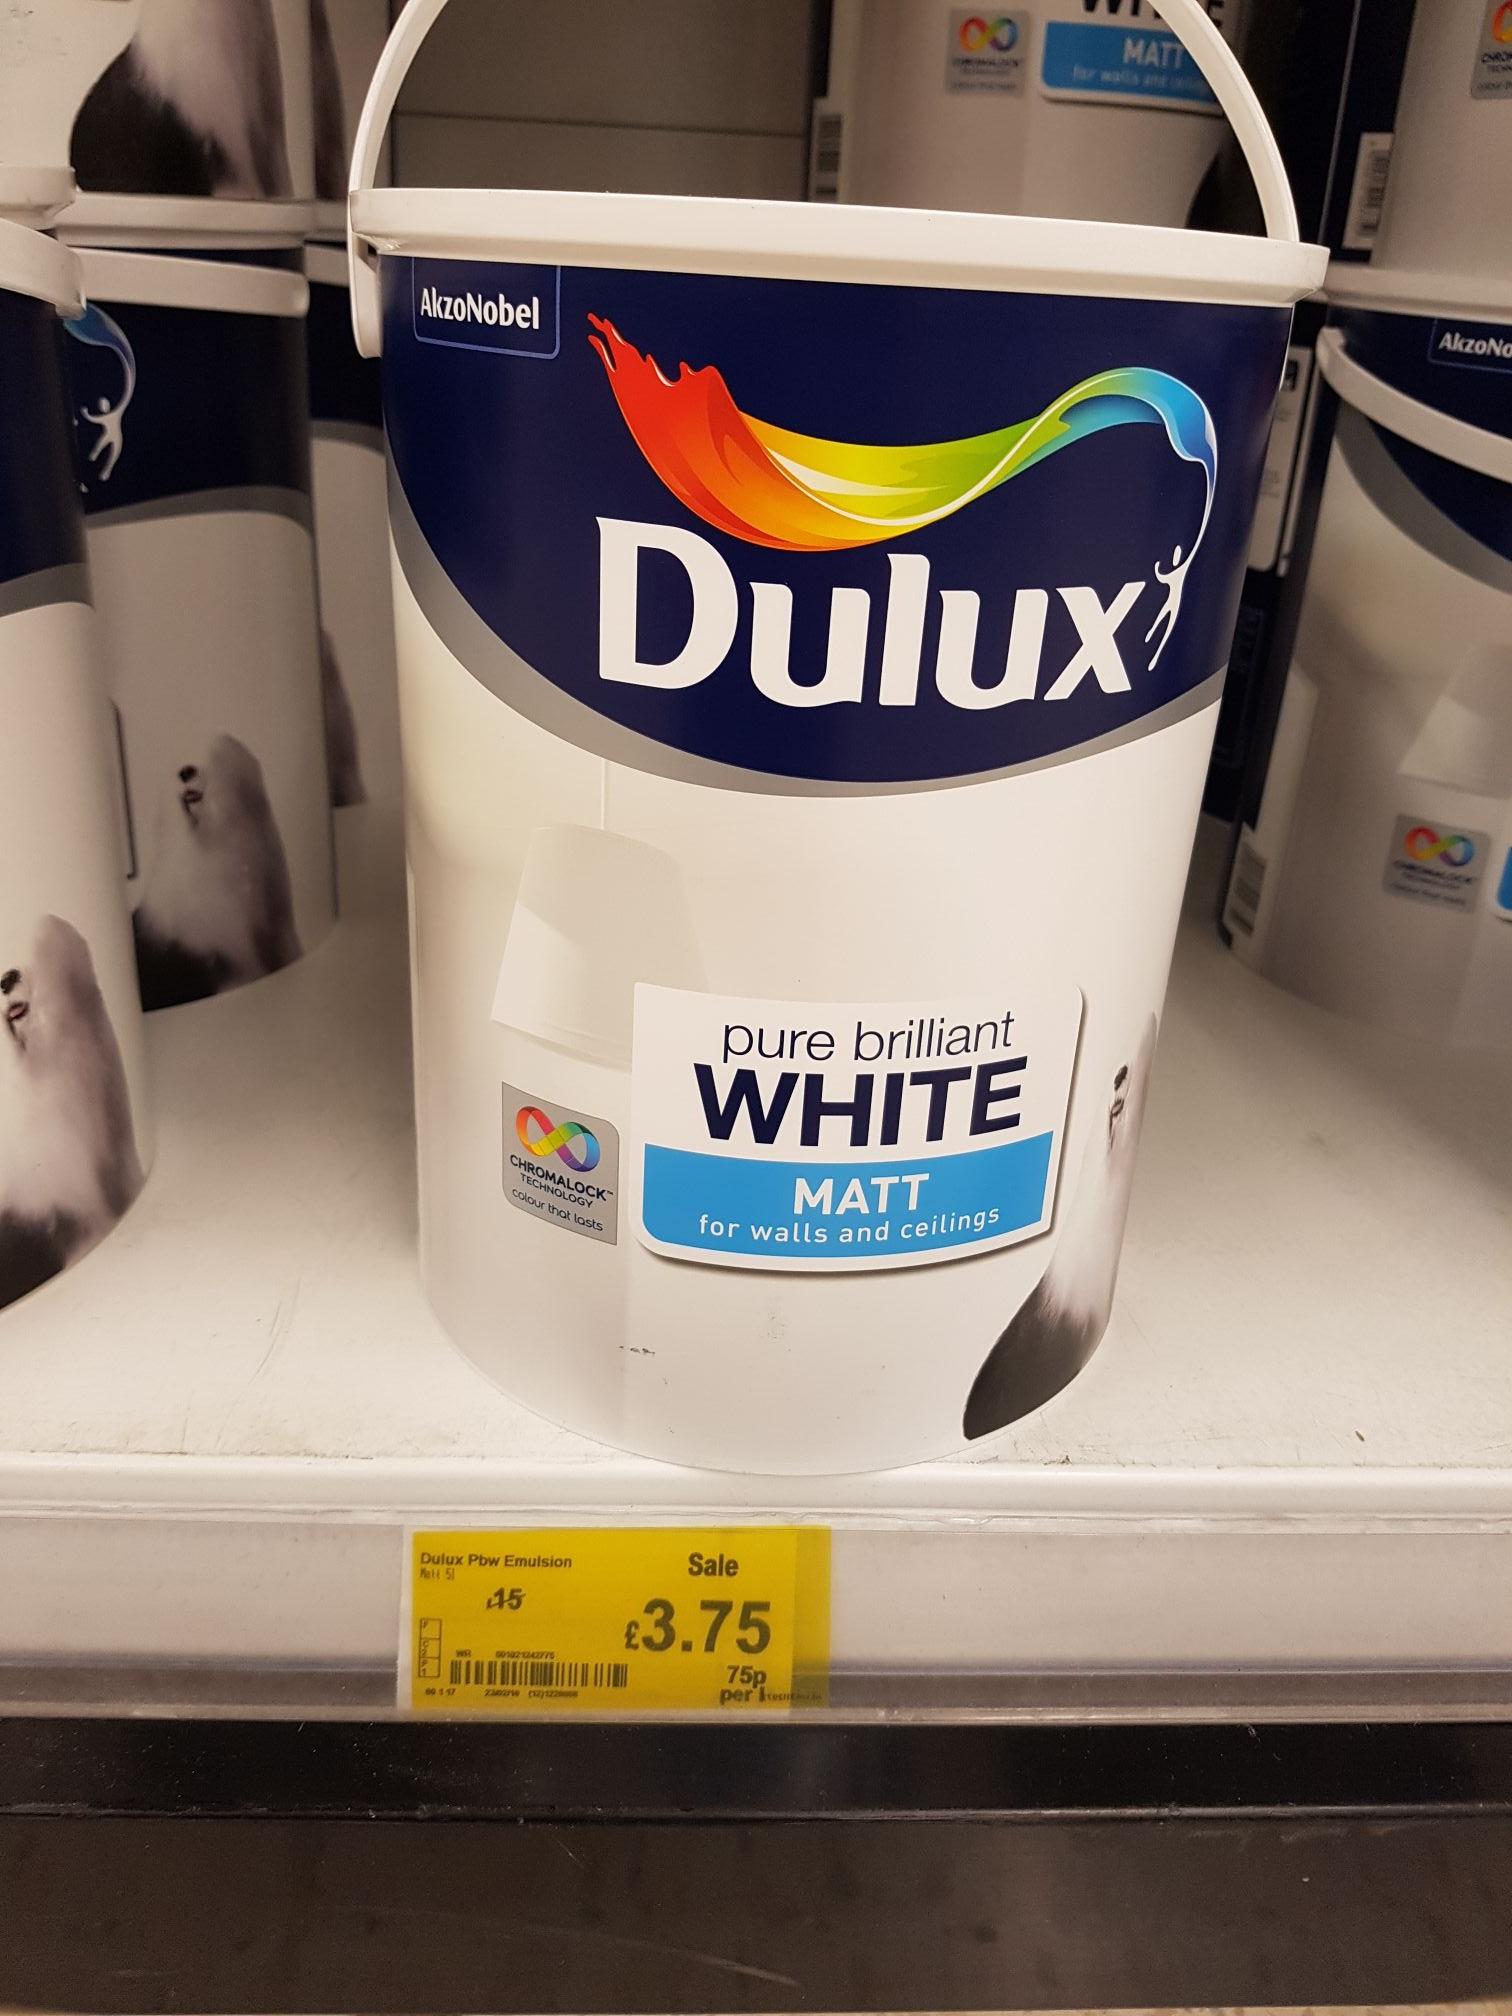 Dulux Pure Brilliant White Matt 5L - £3.75 at Asda instore